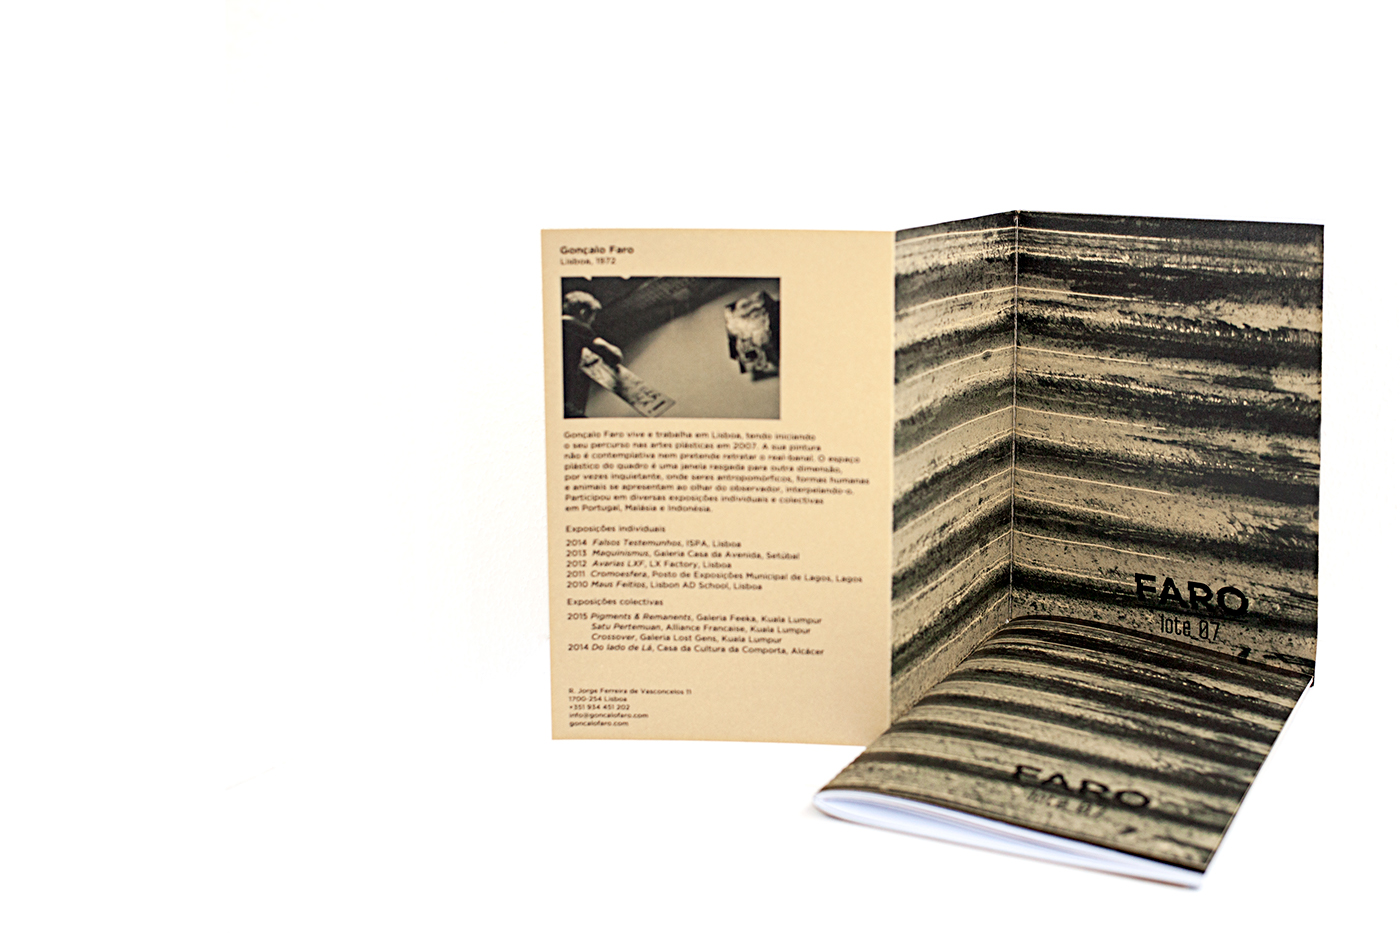 curation art direction  graphic design  design gráfico curadoria Exposição escultura sculpture artist Gonçalo Faro